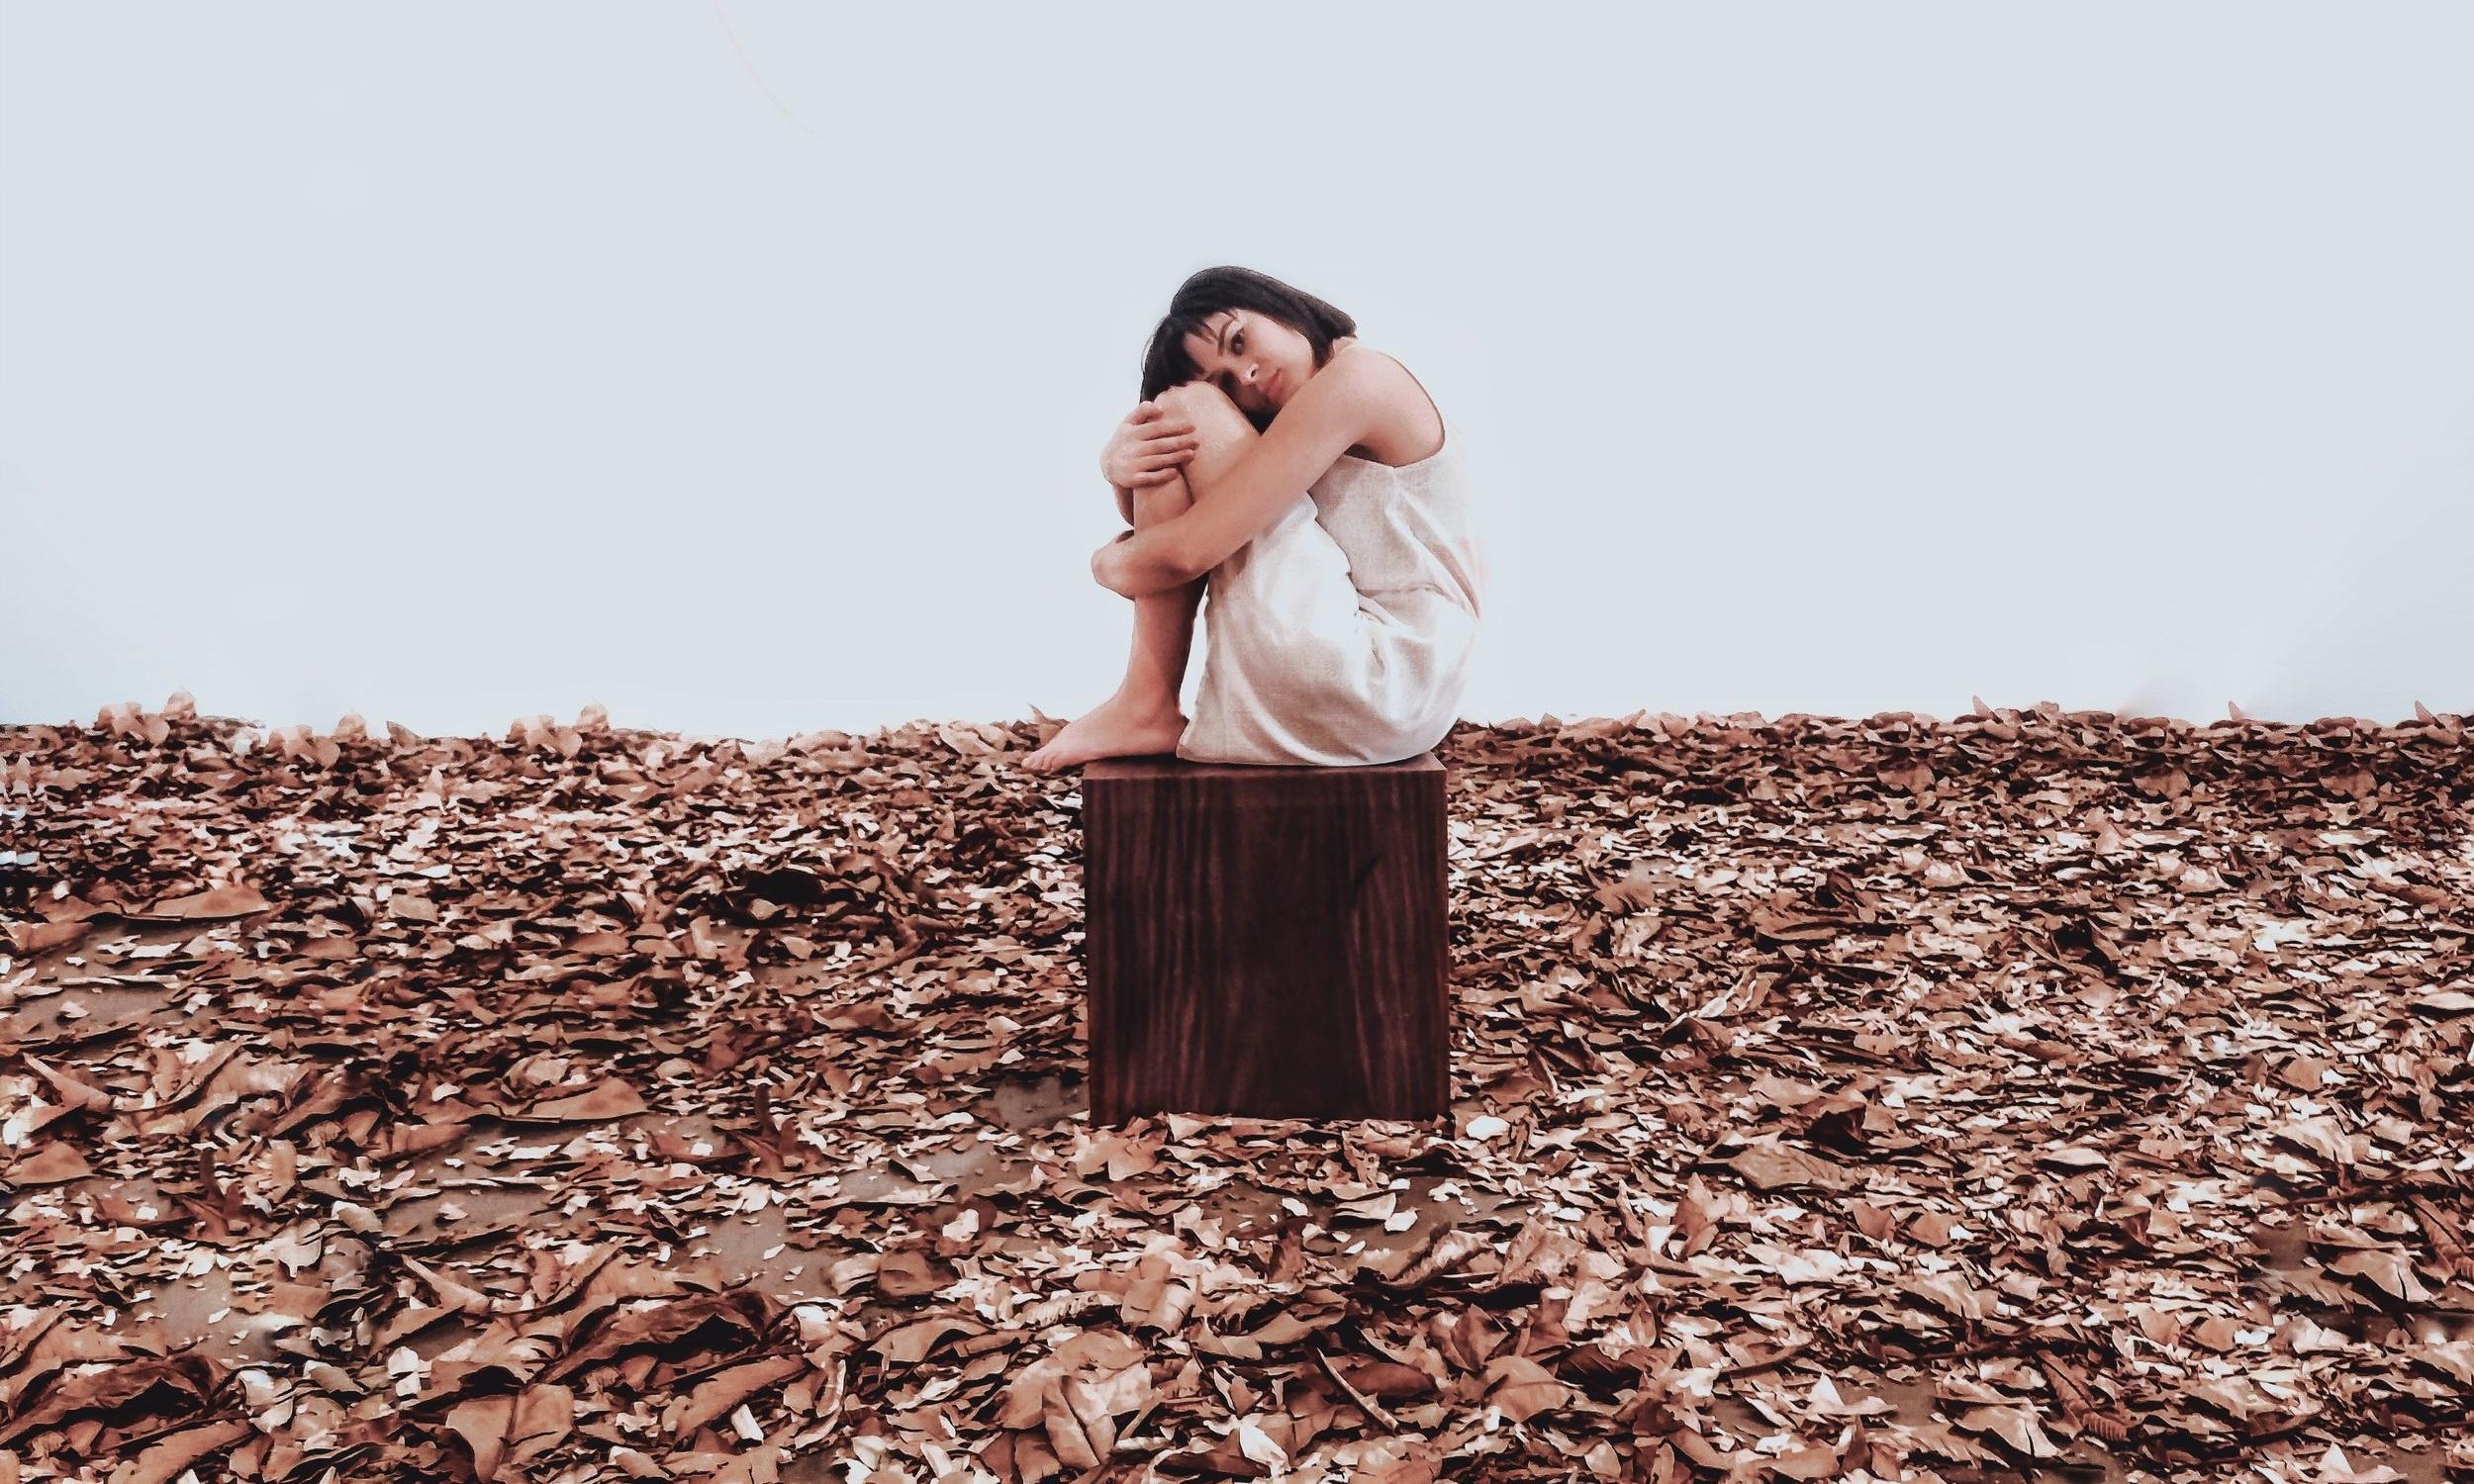 alone-depressed-depression-2653411.jpg